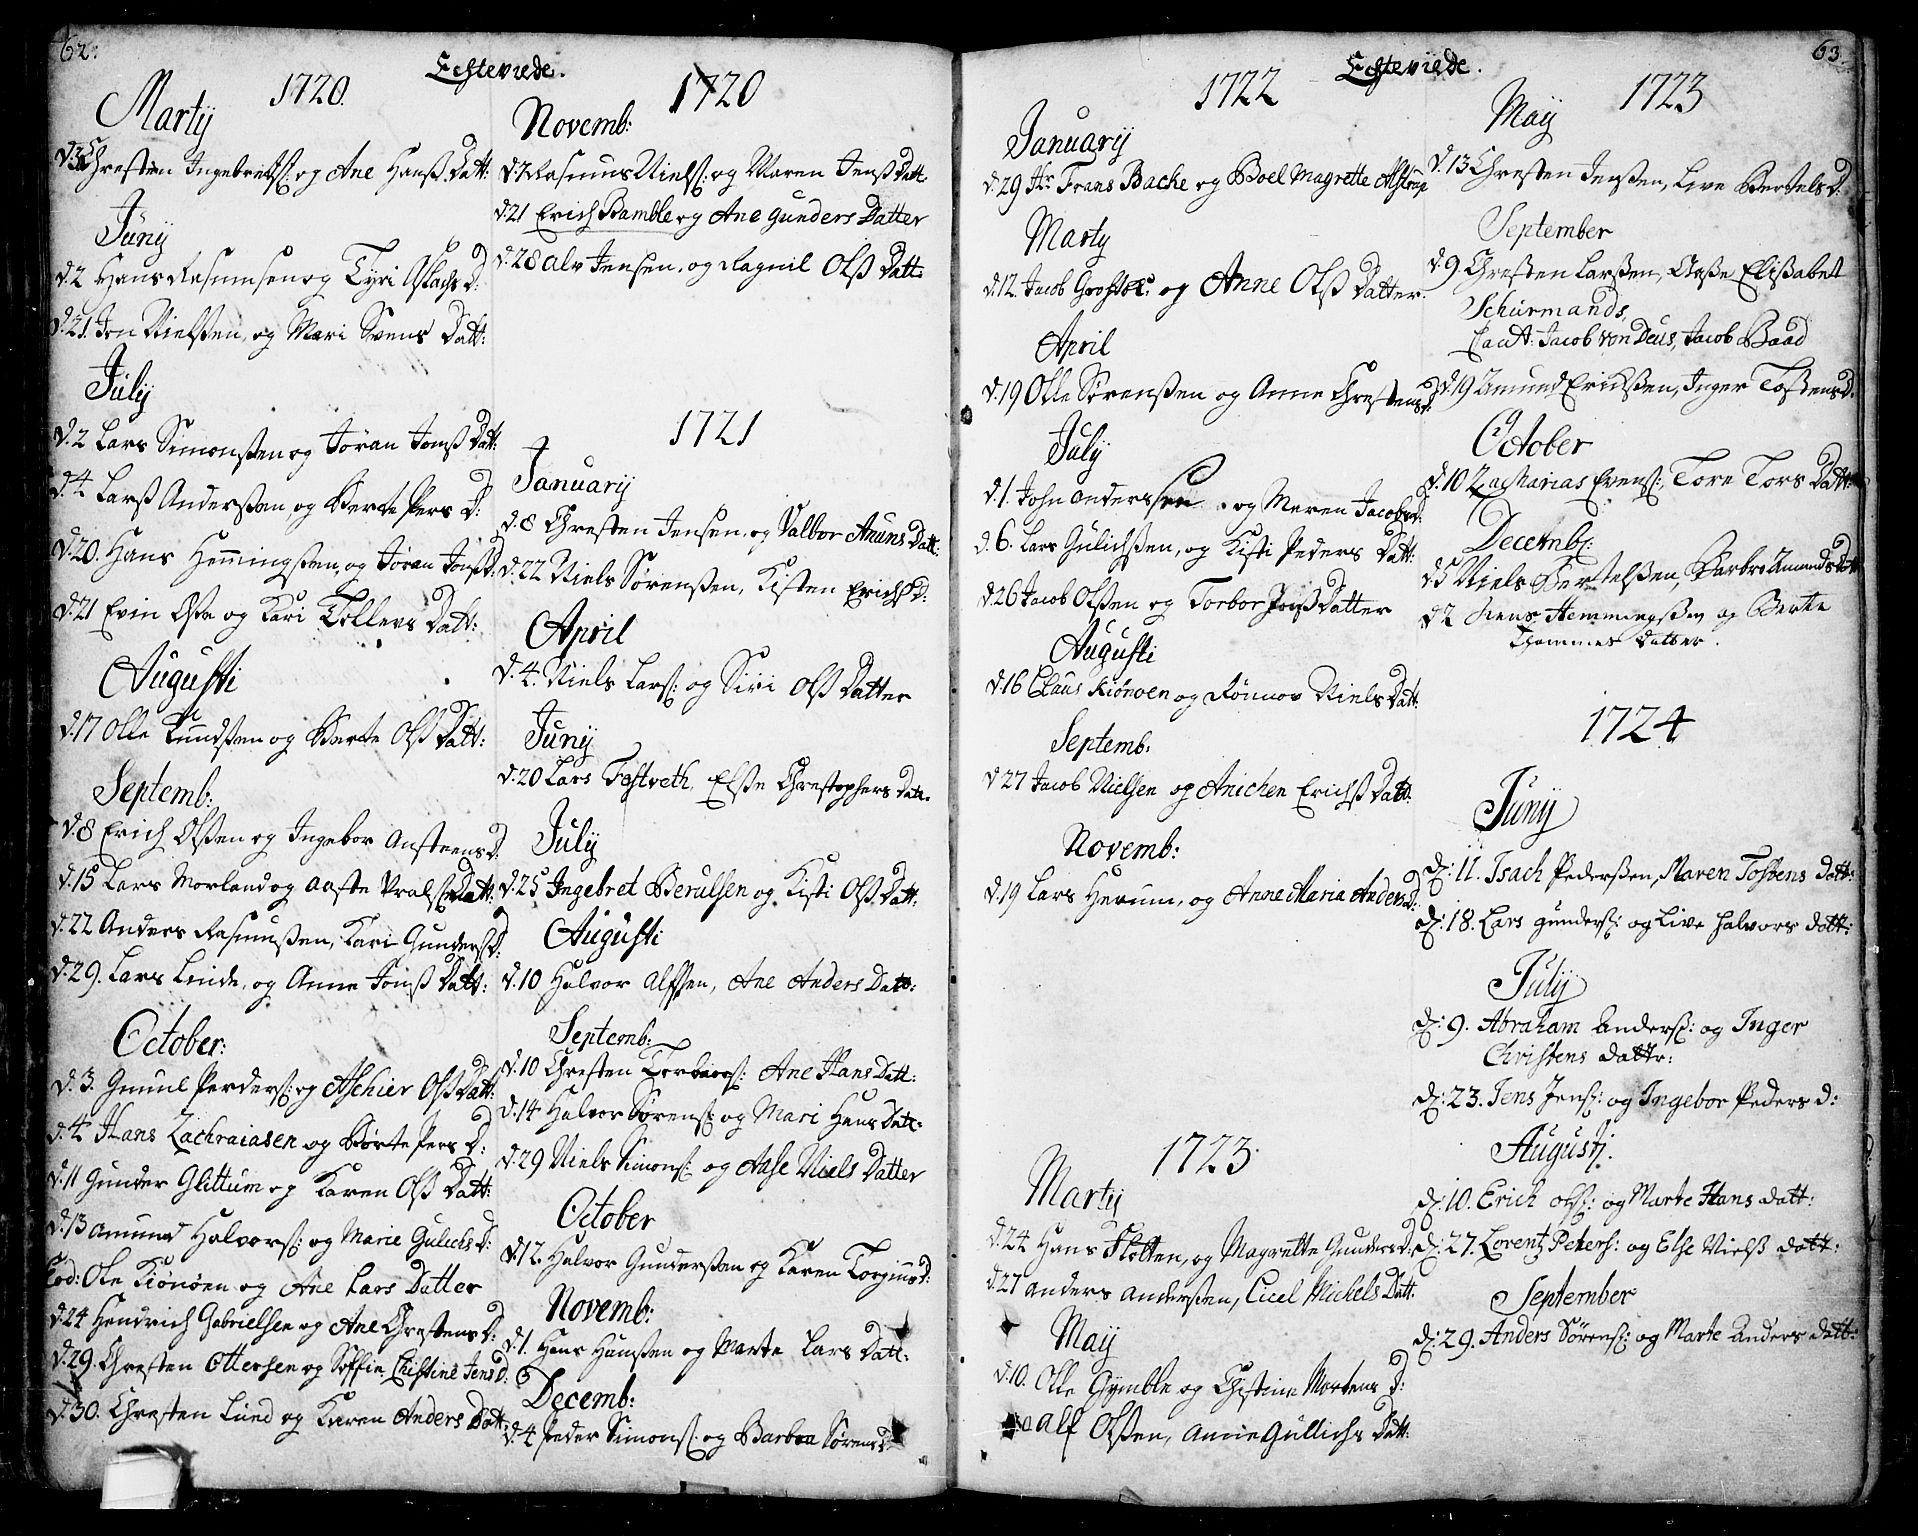 SAKO, Bamble kirkebøker, F/Fa/L0001: Ministerialbok nr. I 1, 1702-1774, s. 62-63